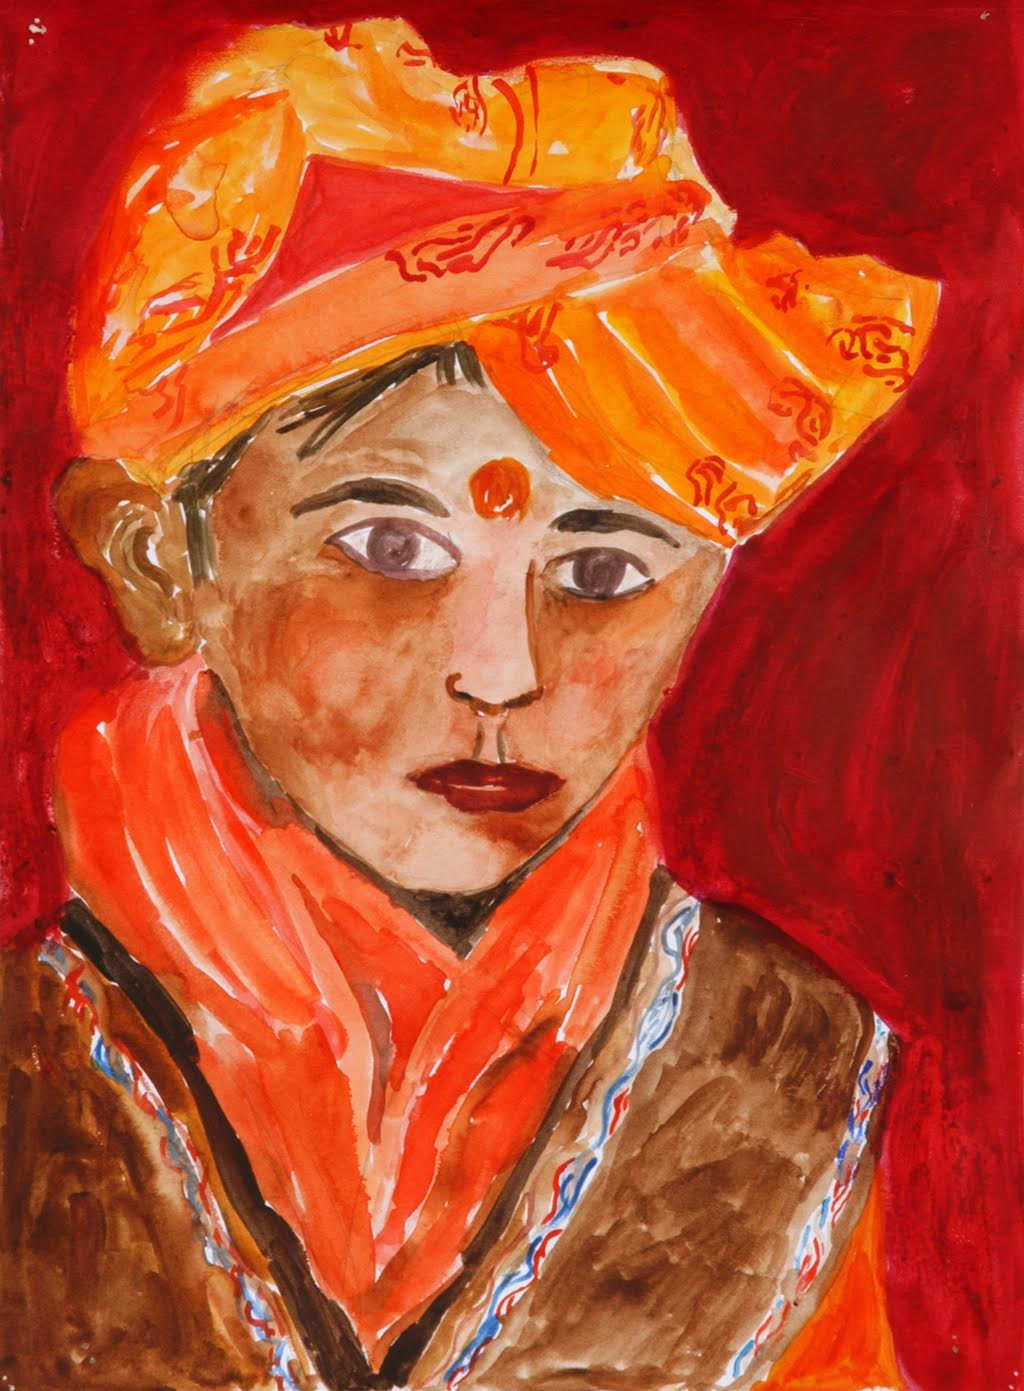 INTERVIEW: Sarah Hunter on Stories With Pallavi Jain